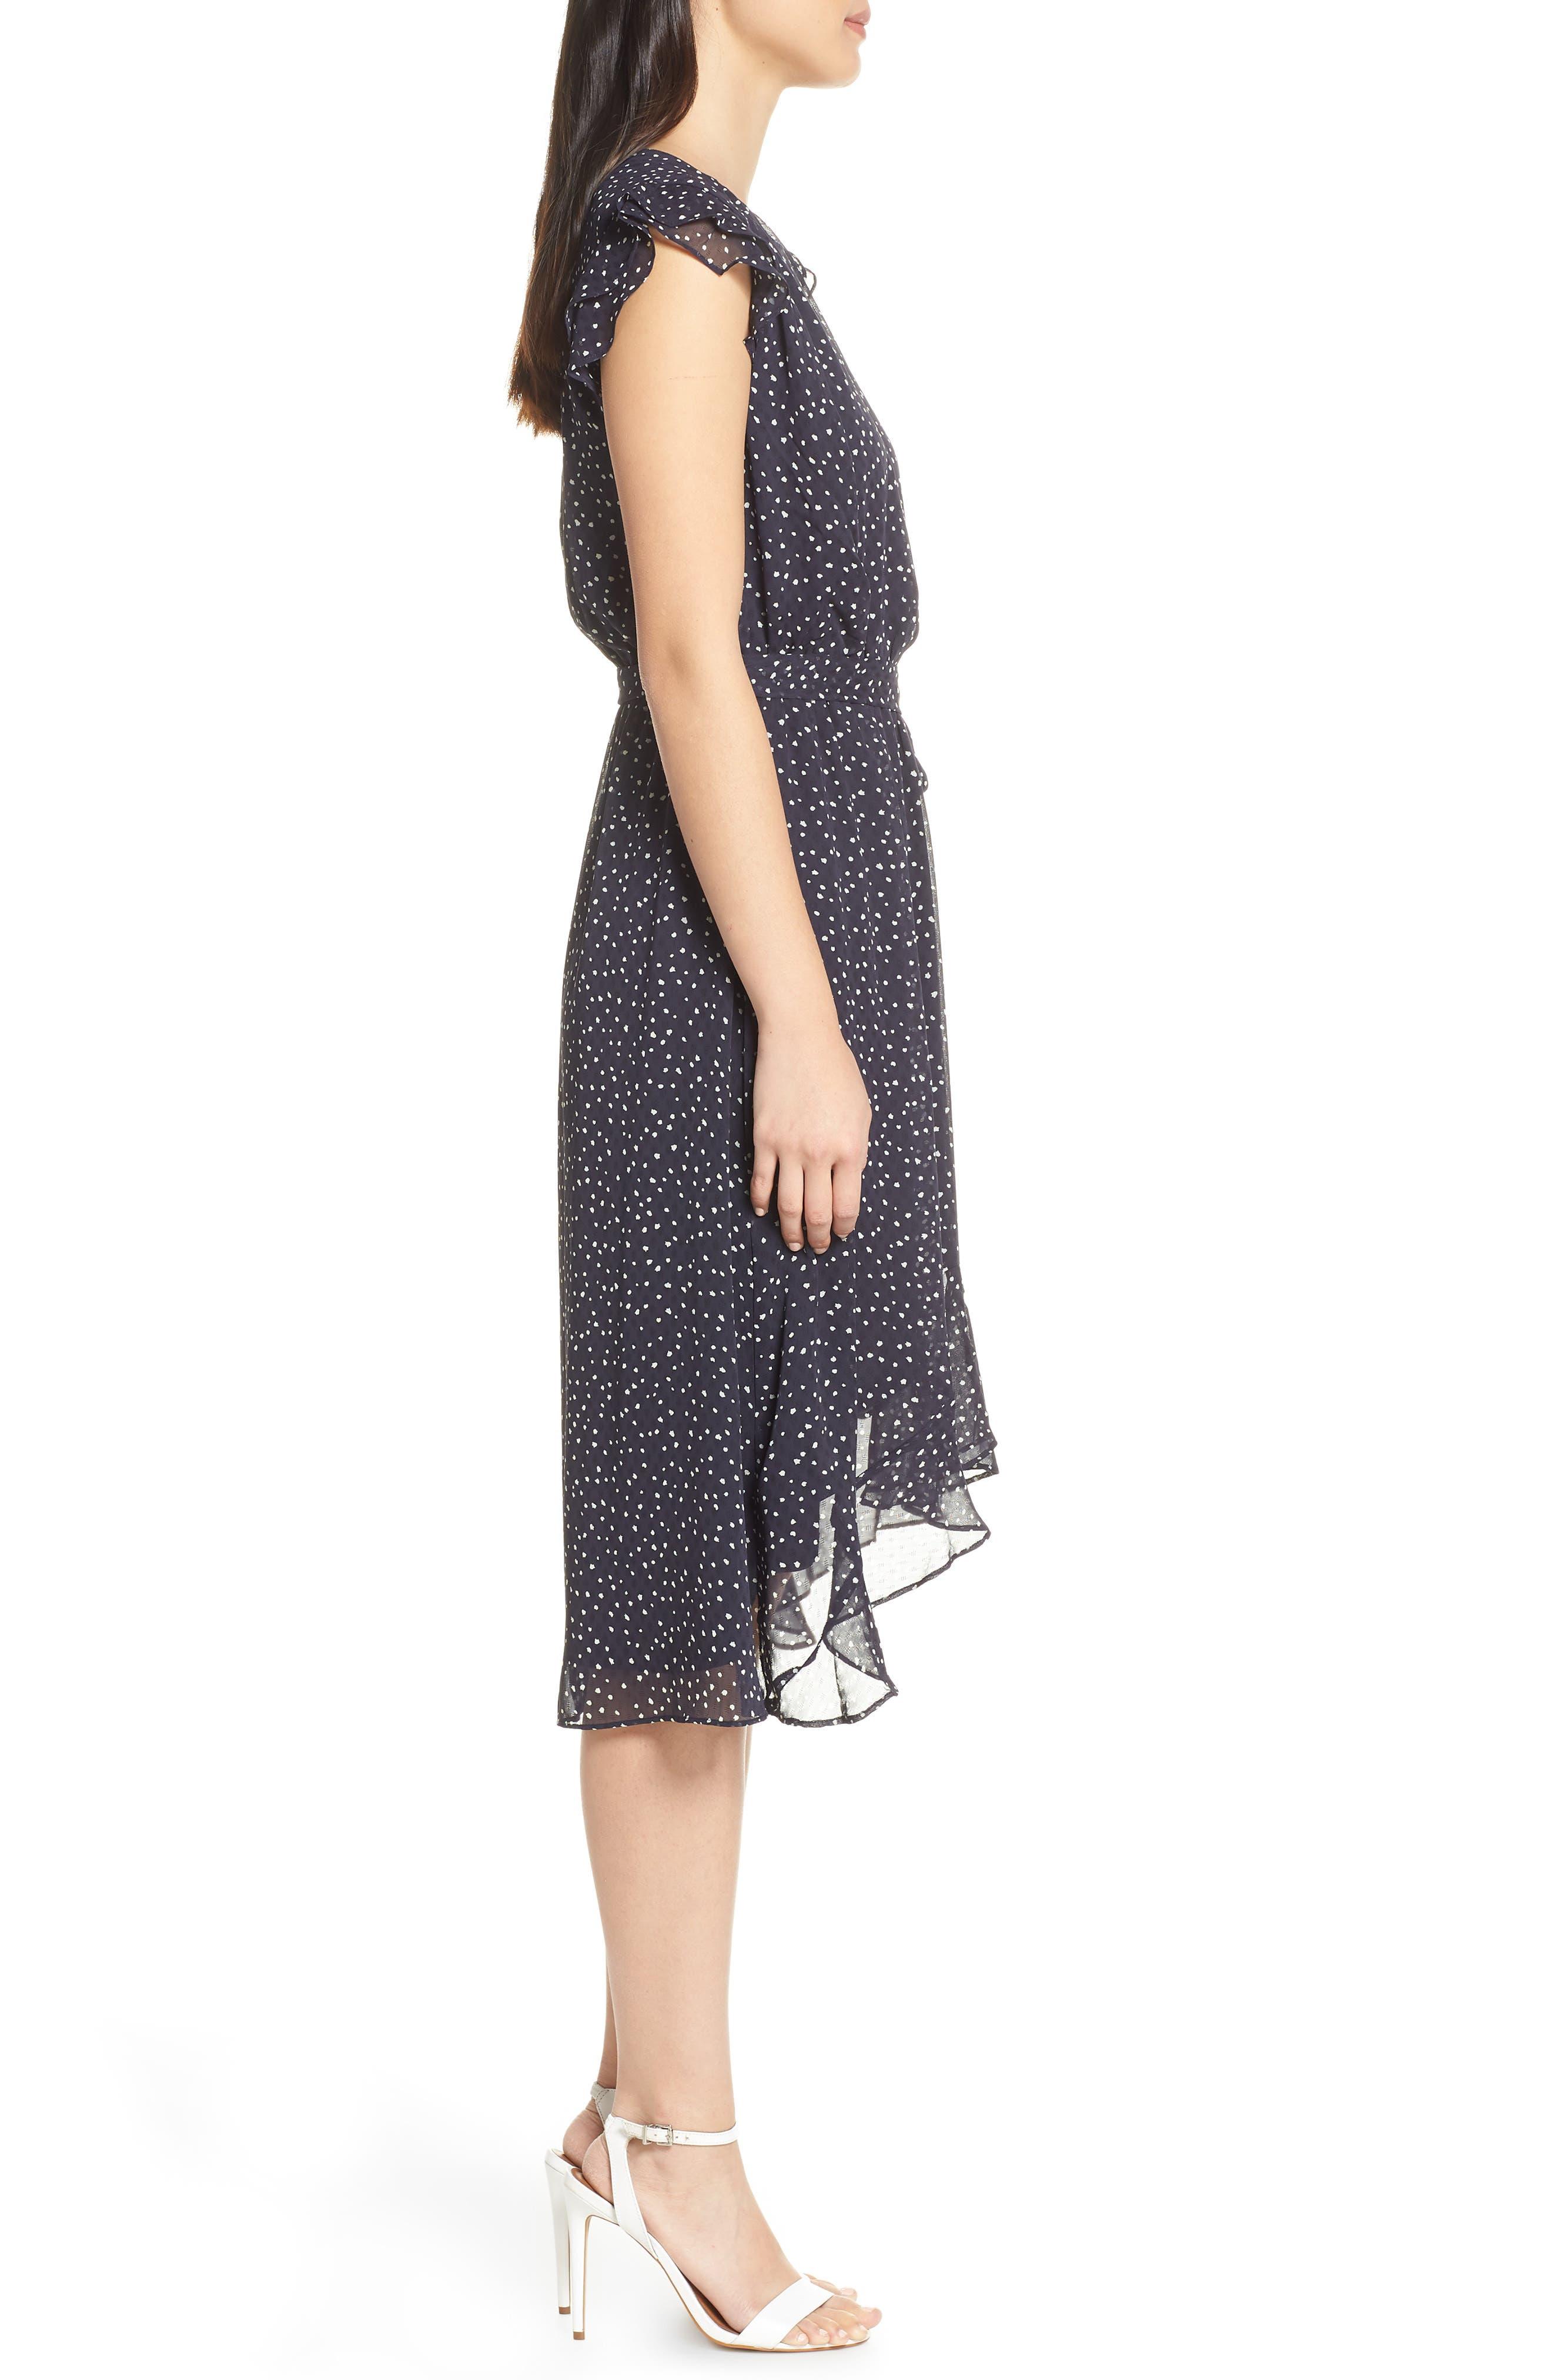 19 COOPER, Polka Dot Ruffle Sleeve Chiffon Dress, Alternate thumbnail 3, color, 400